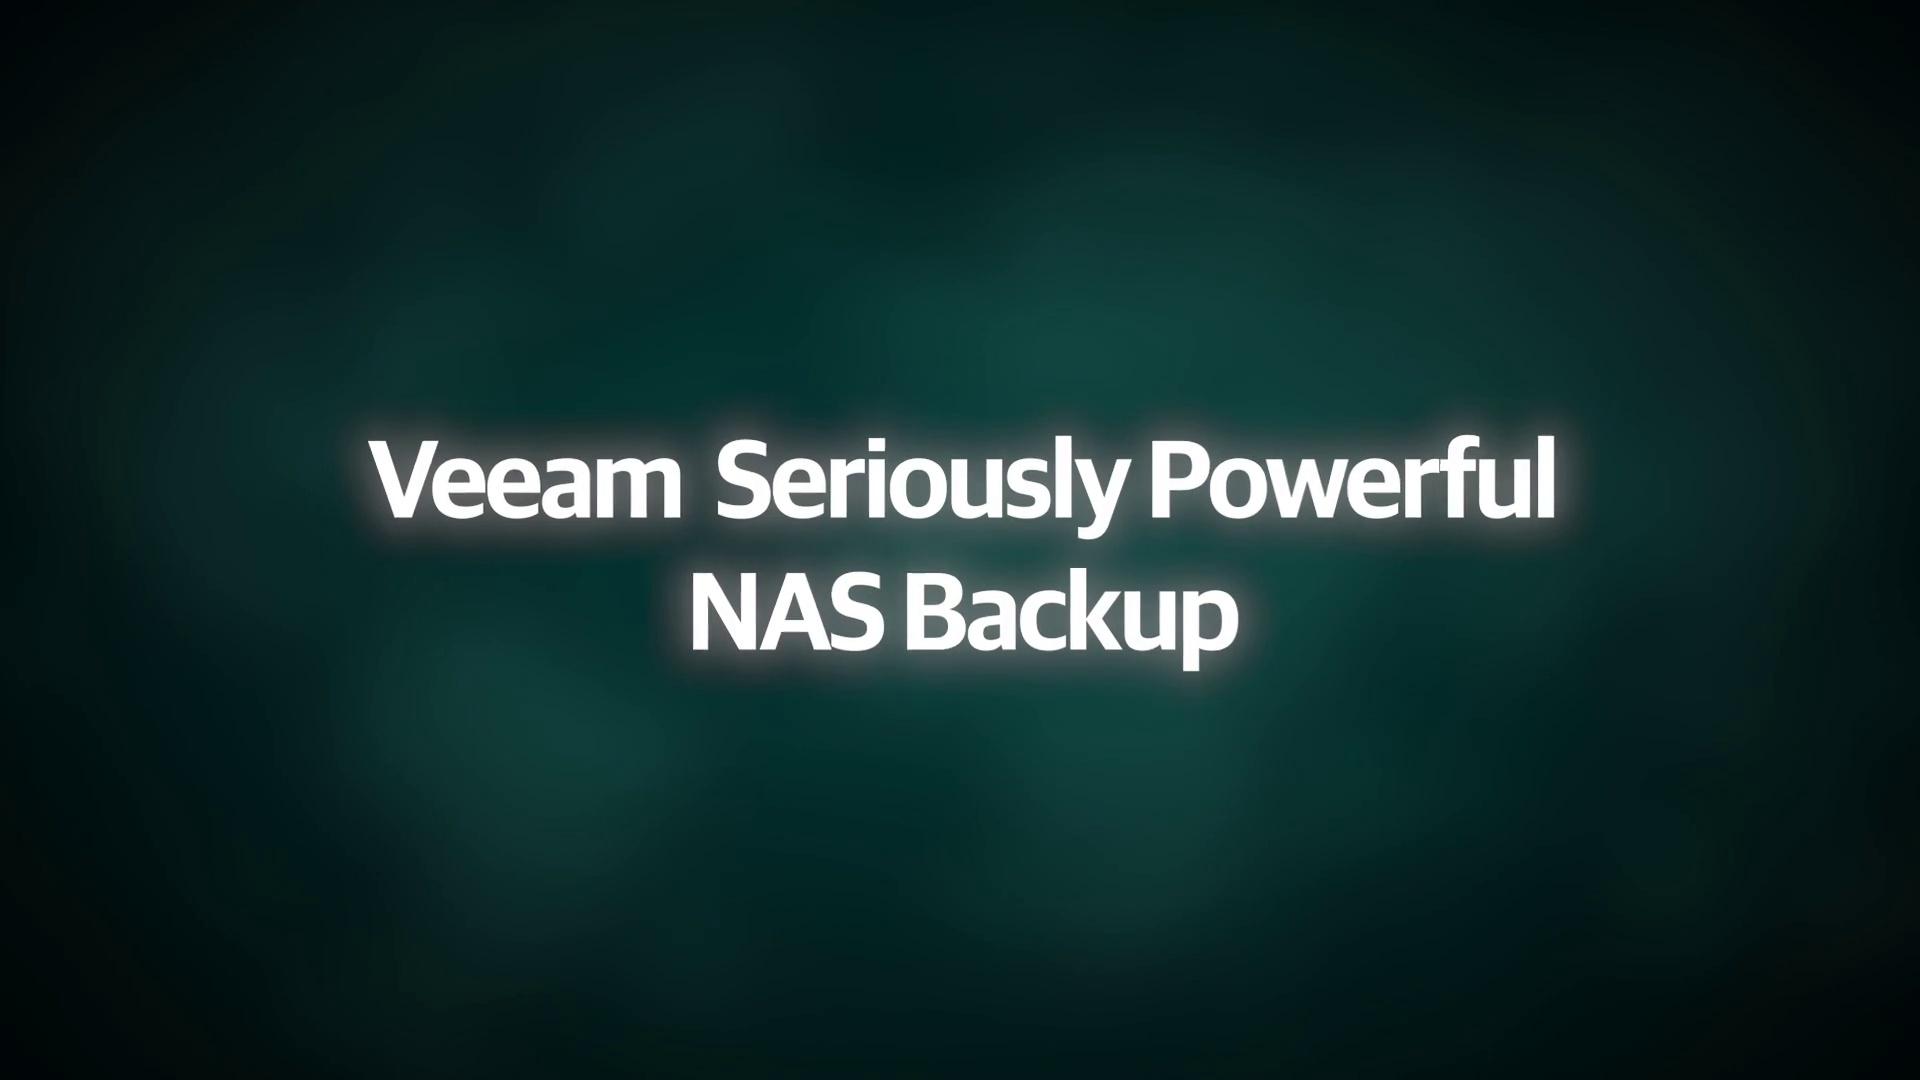 Product Launch: VAS v10 - Demo Lightboard - Veeam Seriously Powerful NAS Backup